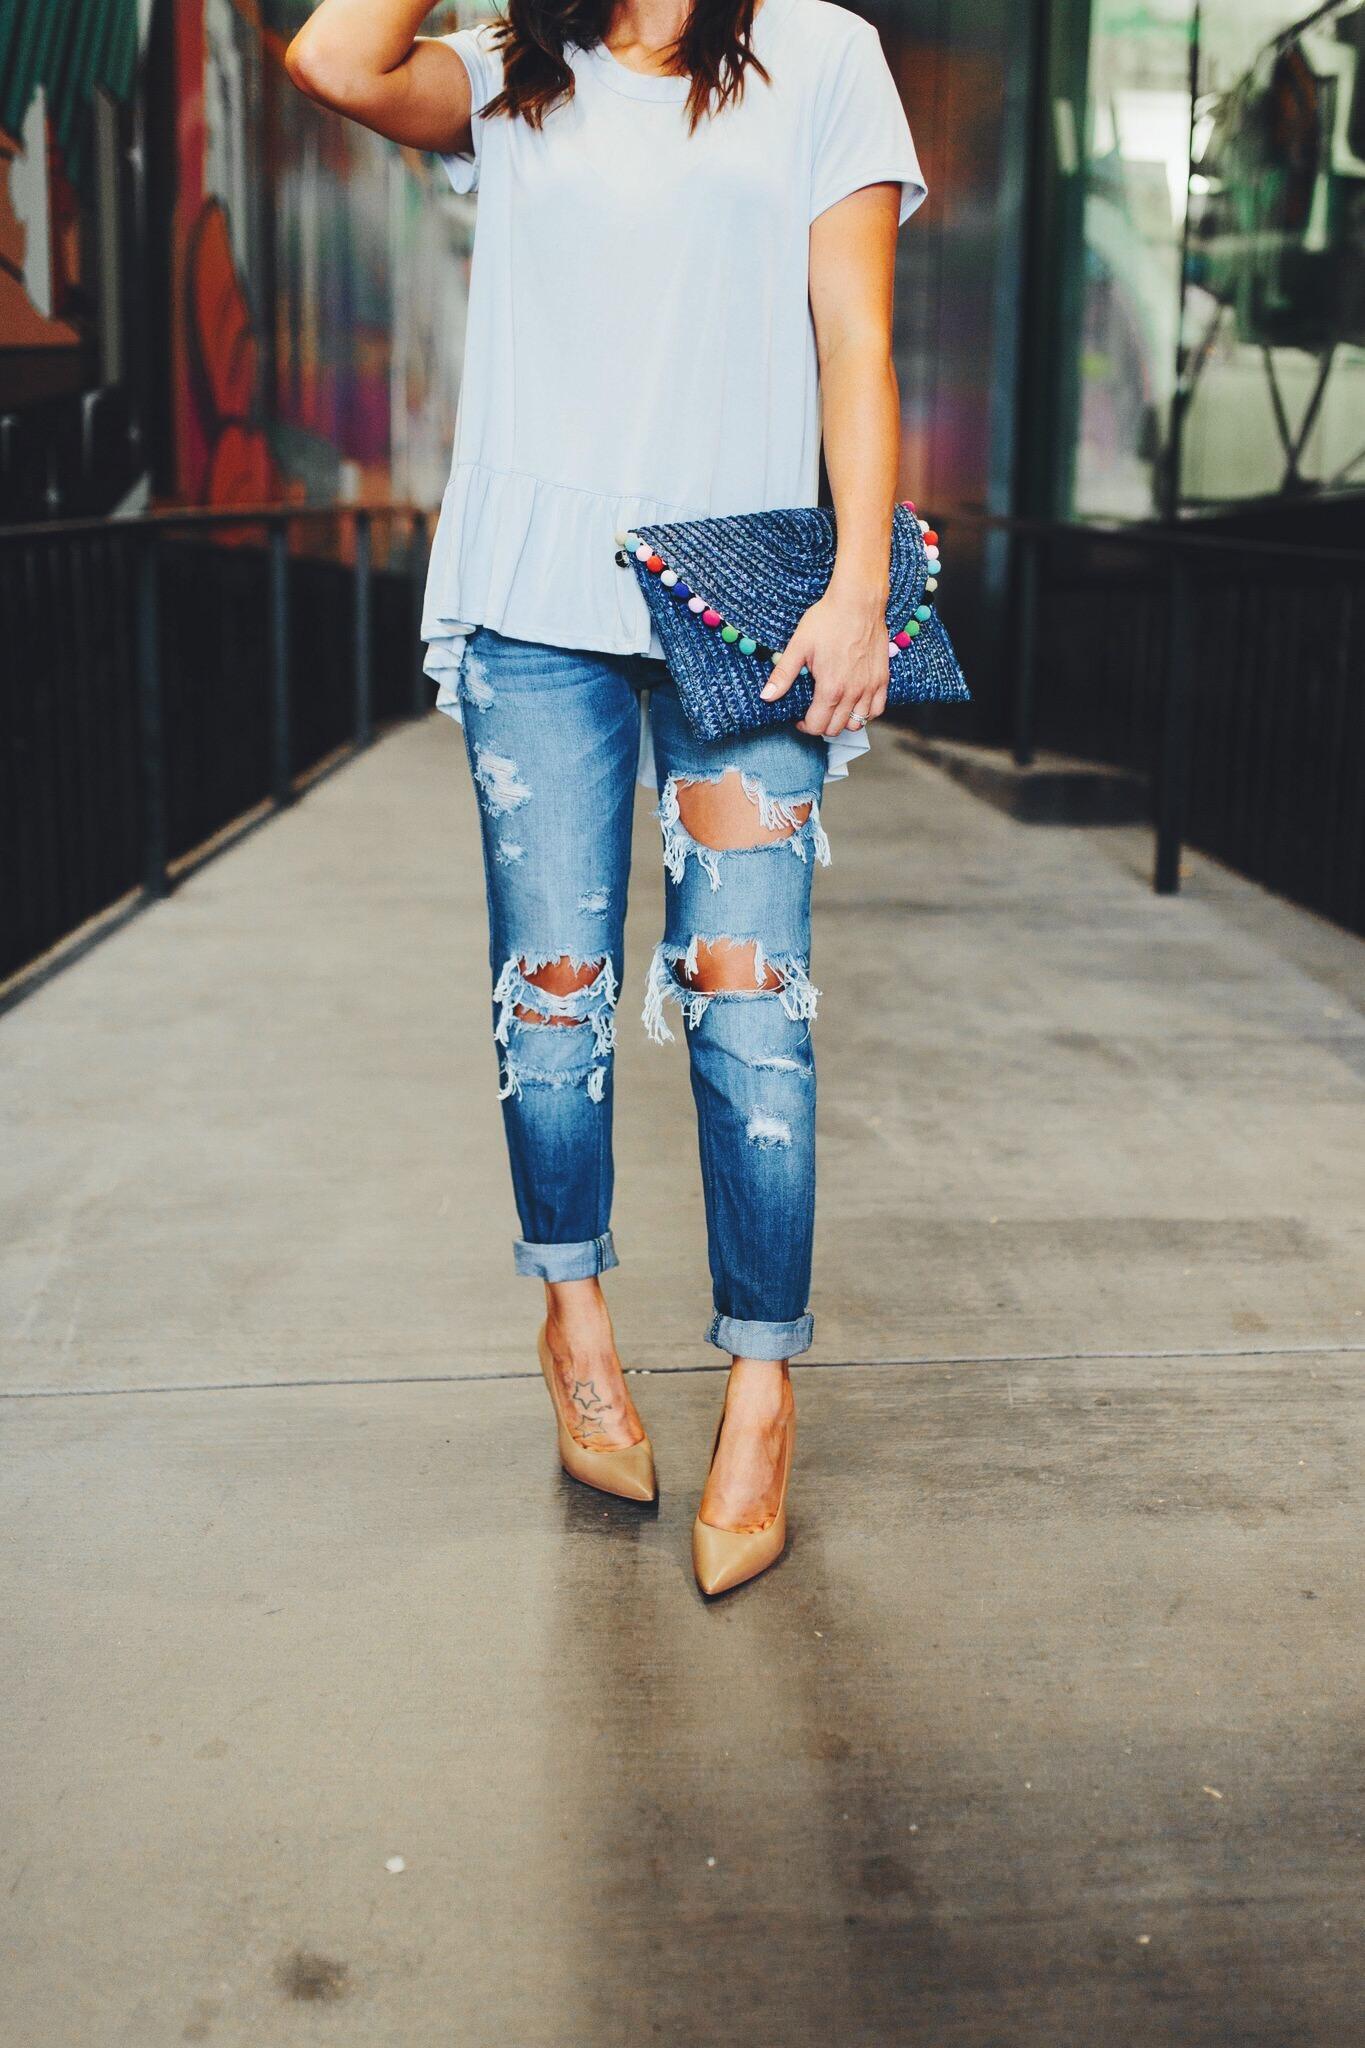 "<img src =""how-to-wear-boyfriend-jeans.jpg"" alt = ""waist-down-look-at-fashion-blogger-teddybearsandlipstick's-boyfriend-jeans-outfit-styled-with-caramel-colored-sam-edelman-hazel-pumps-and-a-peplum-top"">"